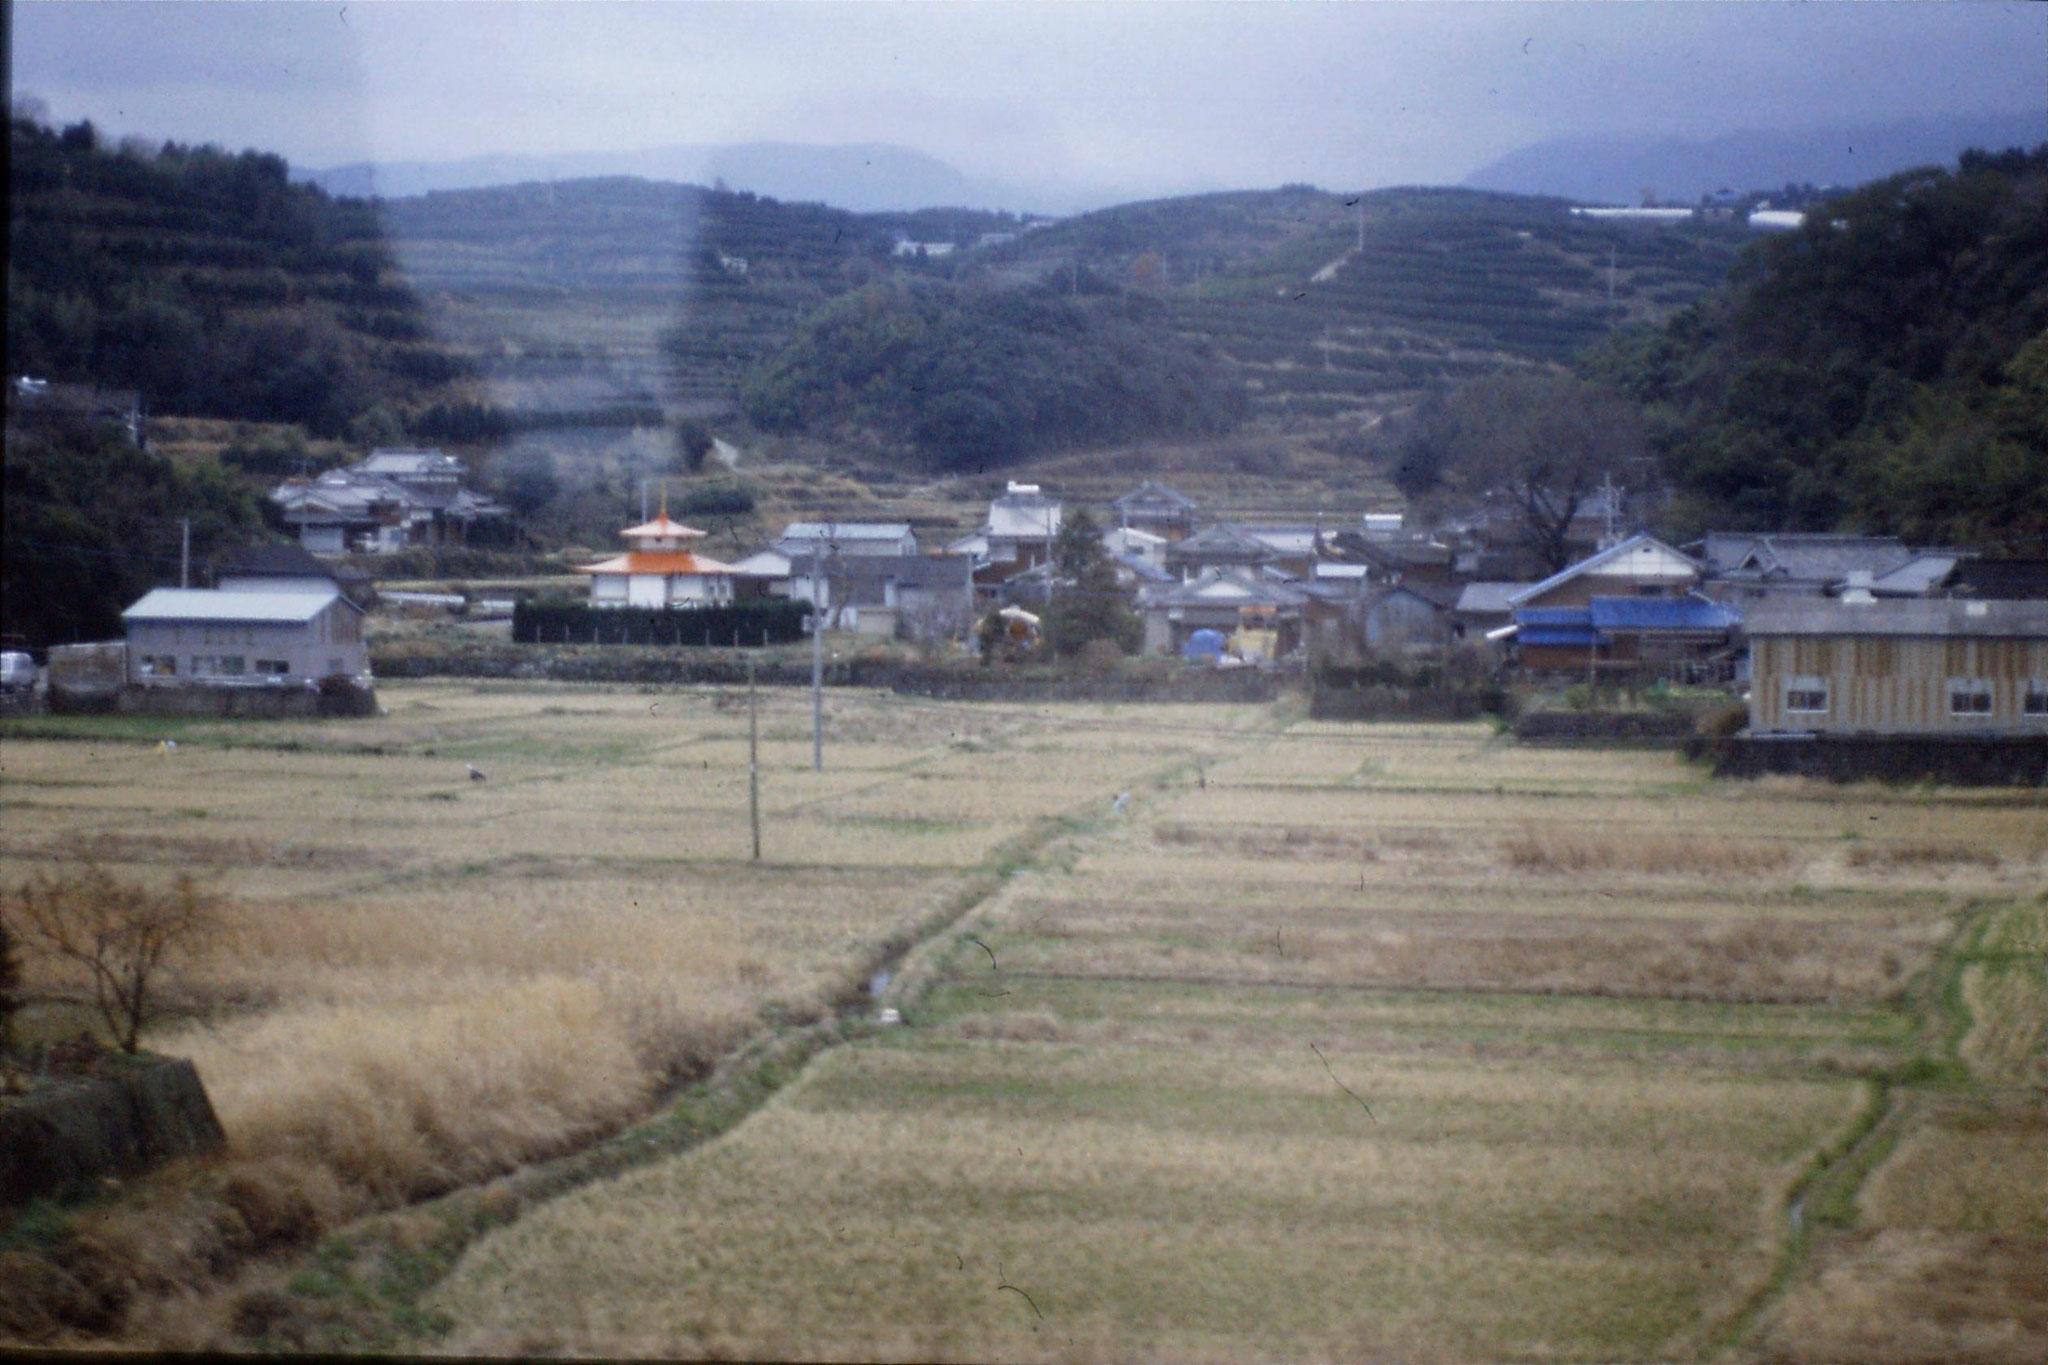 19/1/1989: 33: before Kagoshima